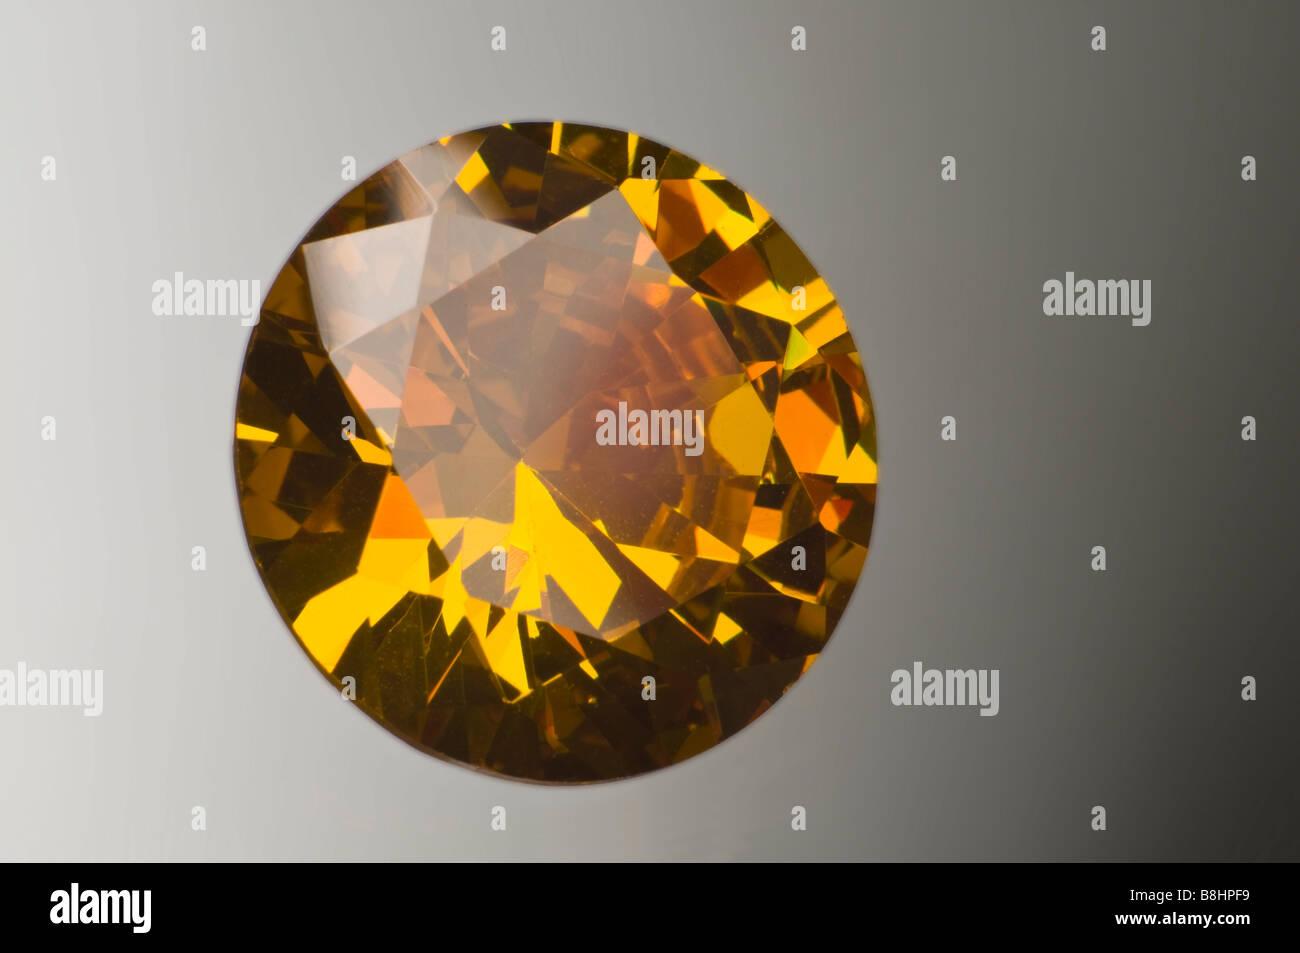 Round-cut Citrine Gemstone (Synthetic; lab-created) - Stock Image